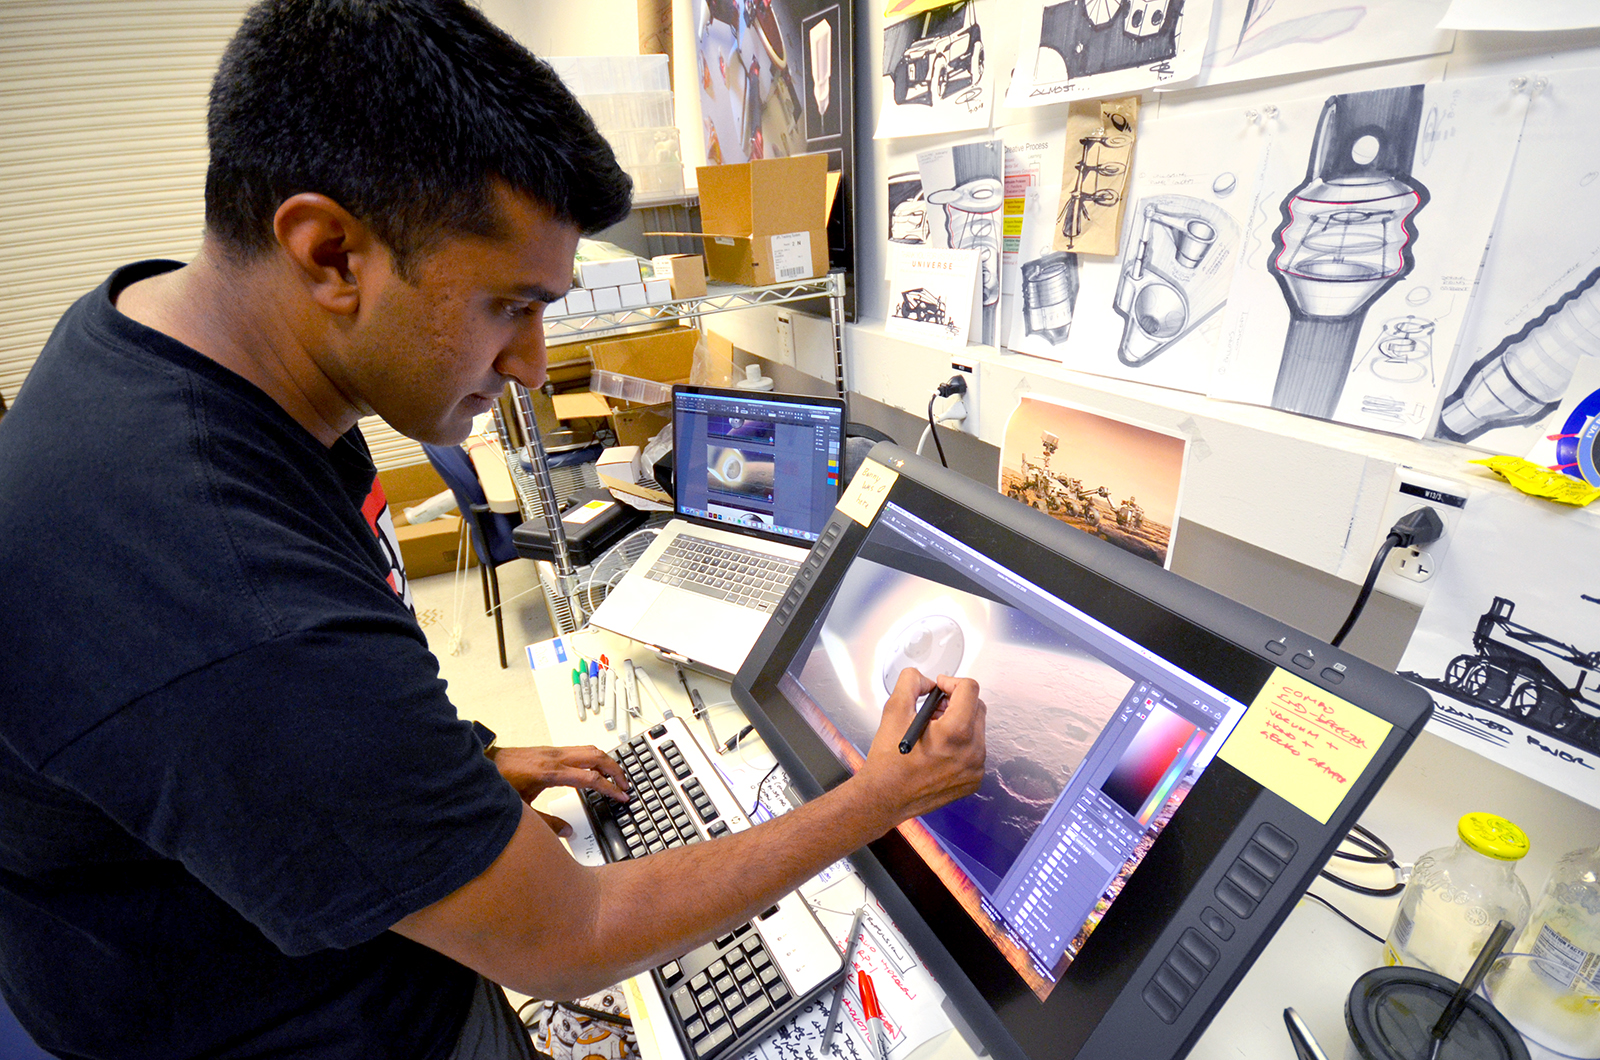 Omar Rehman works on an illustration at JPL